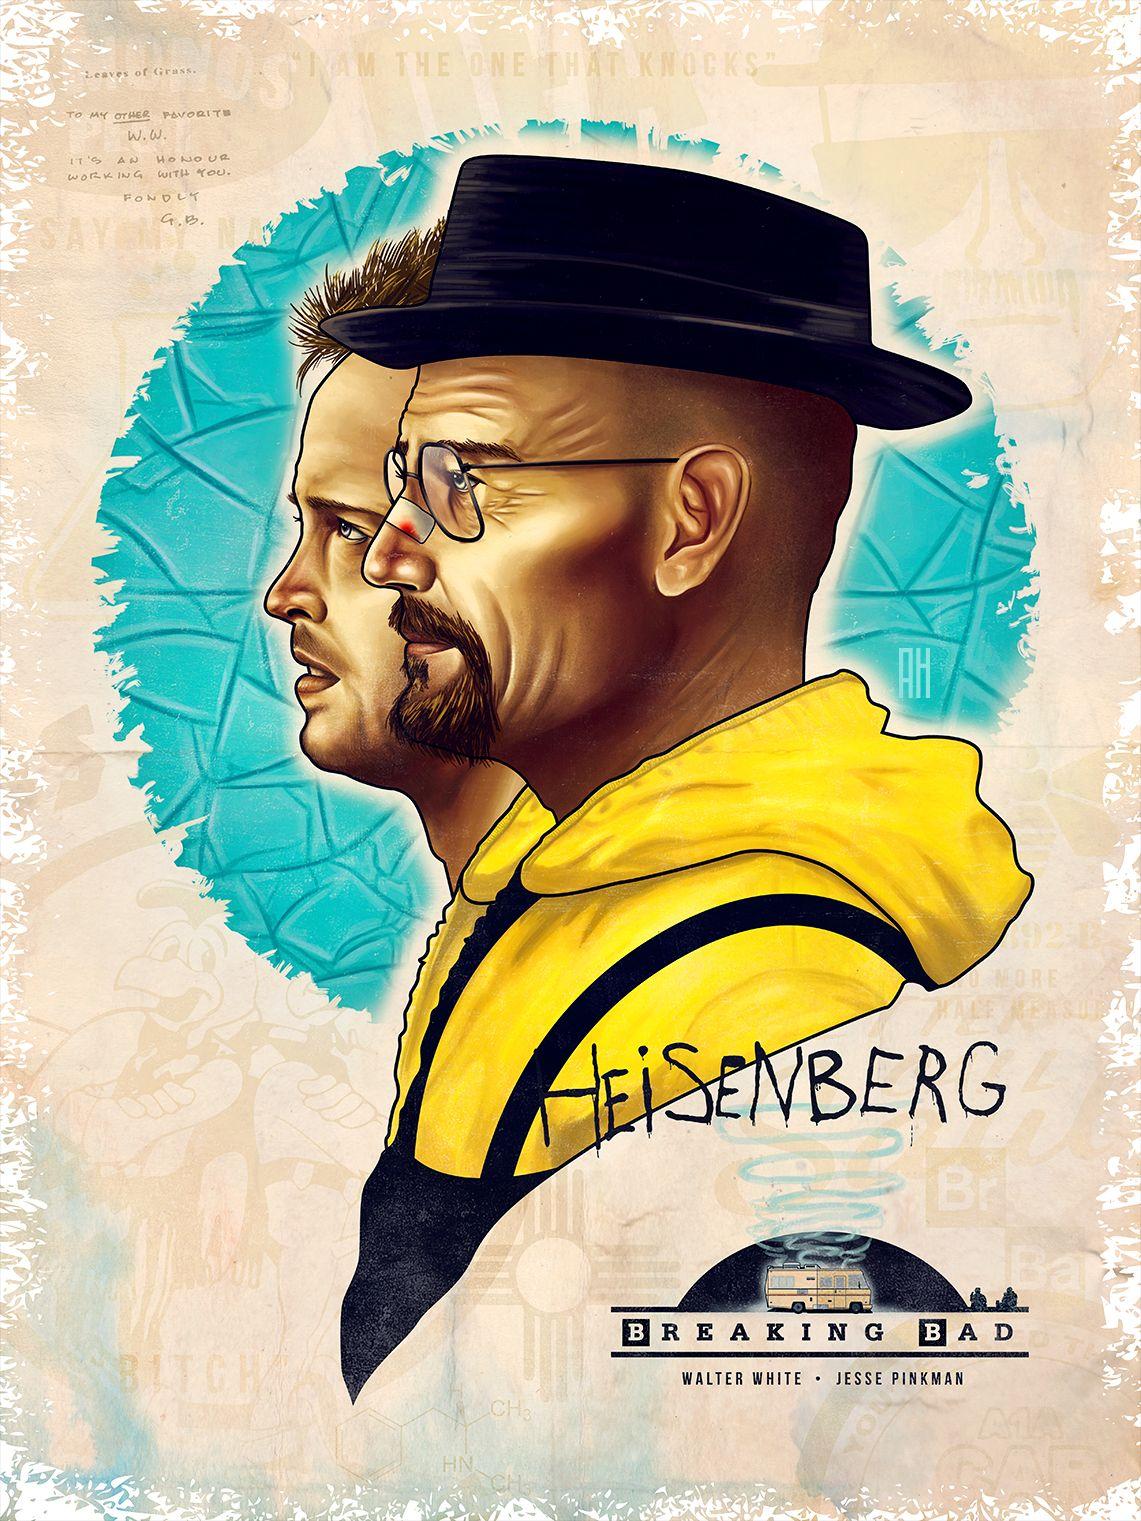 Breaking Bad Original Film Poster Alex Hess Breaking Bad